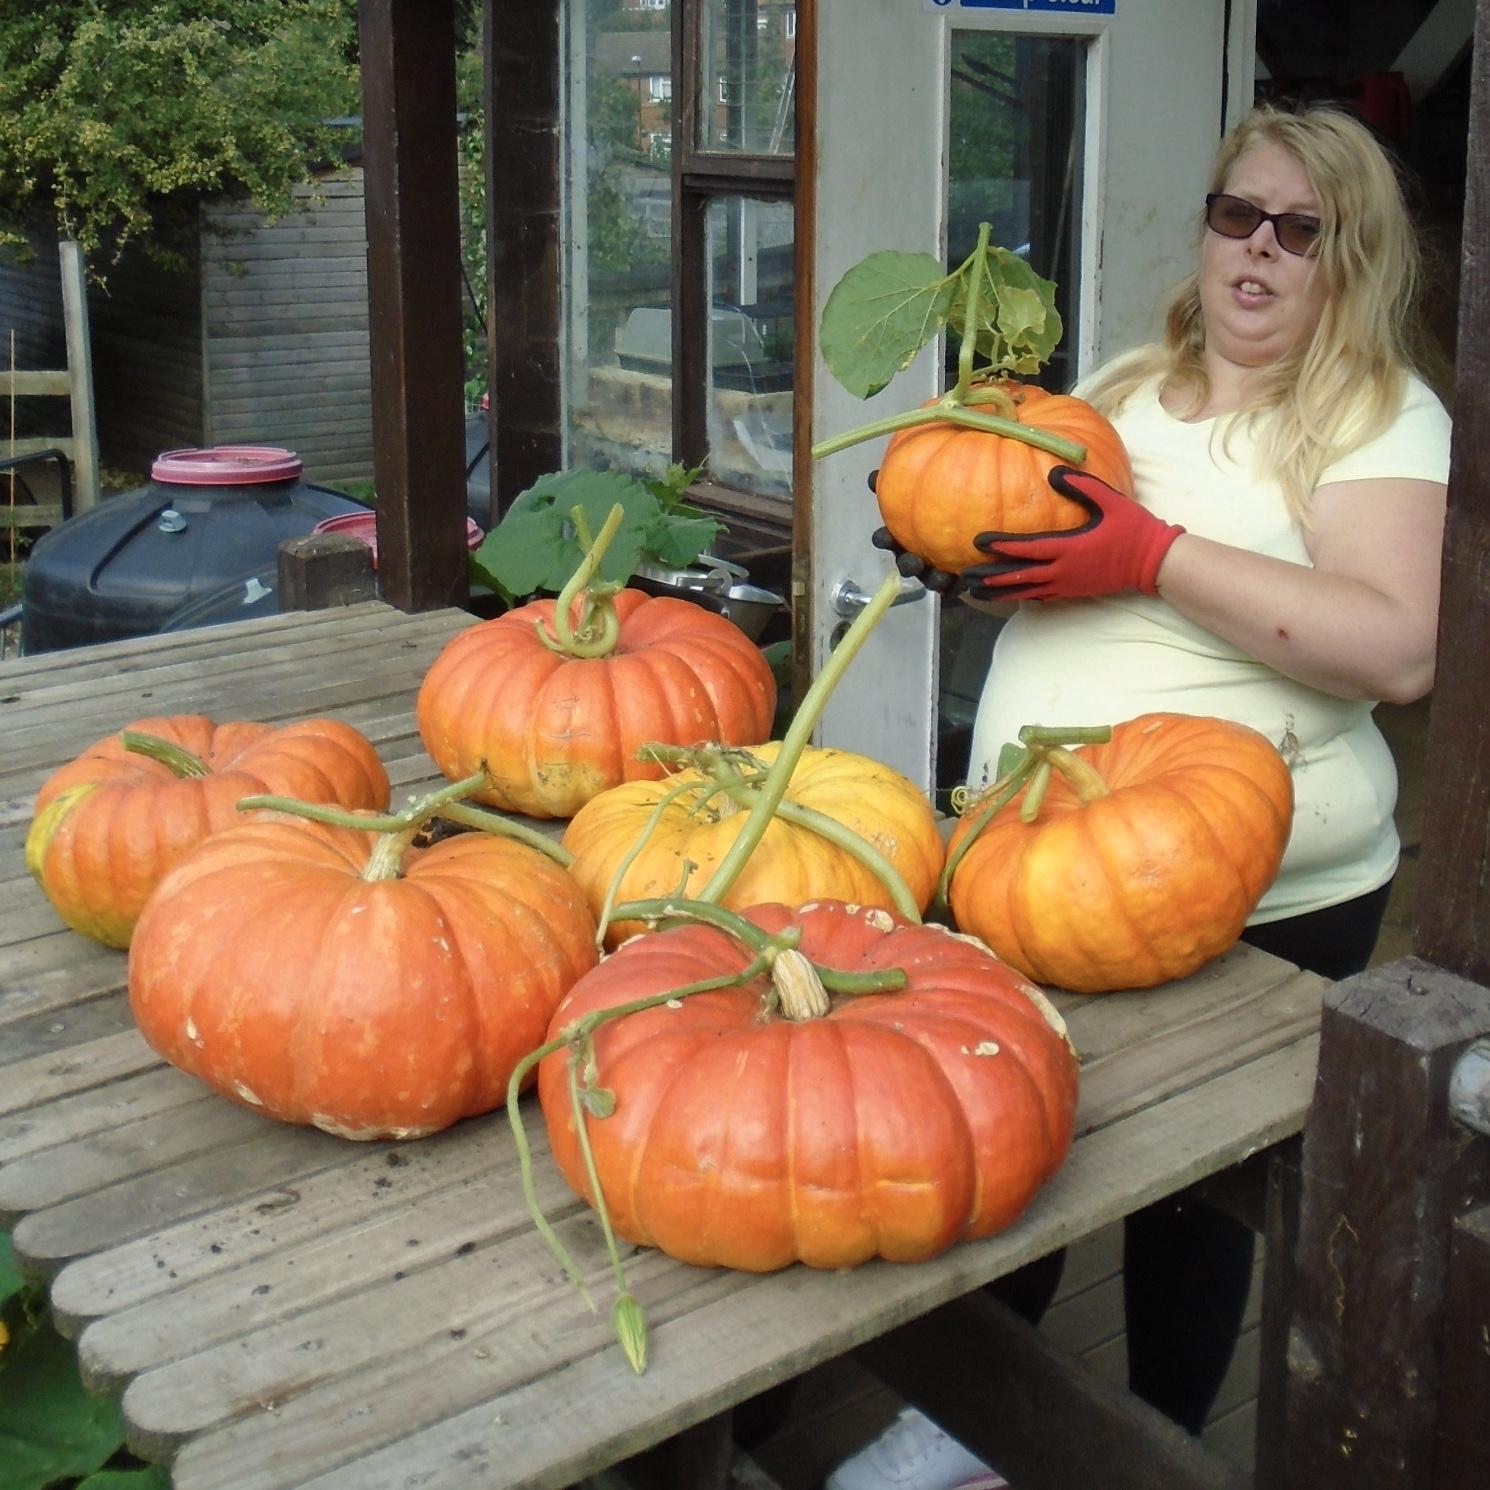 Heaviest Pumpkin: Surrey Docks Farm